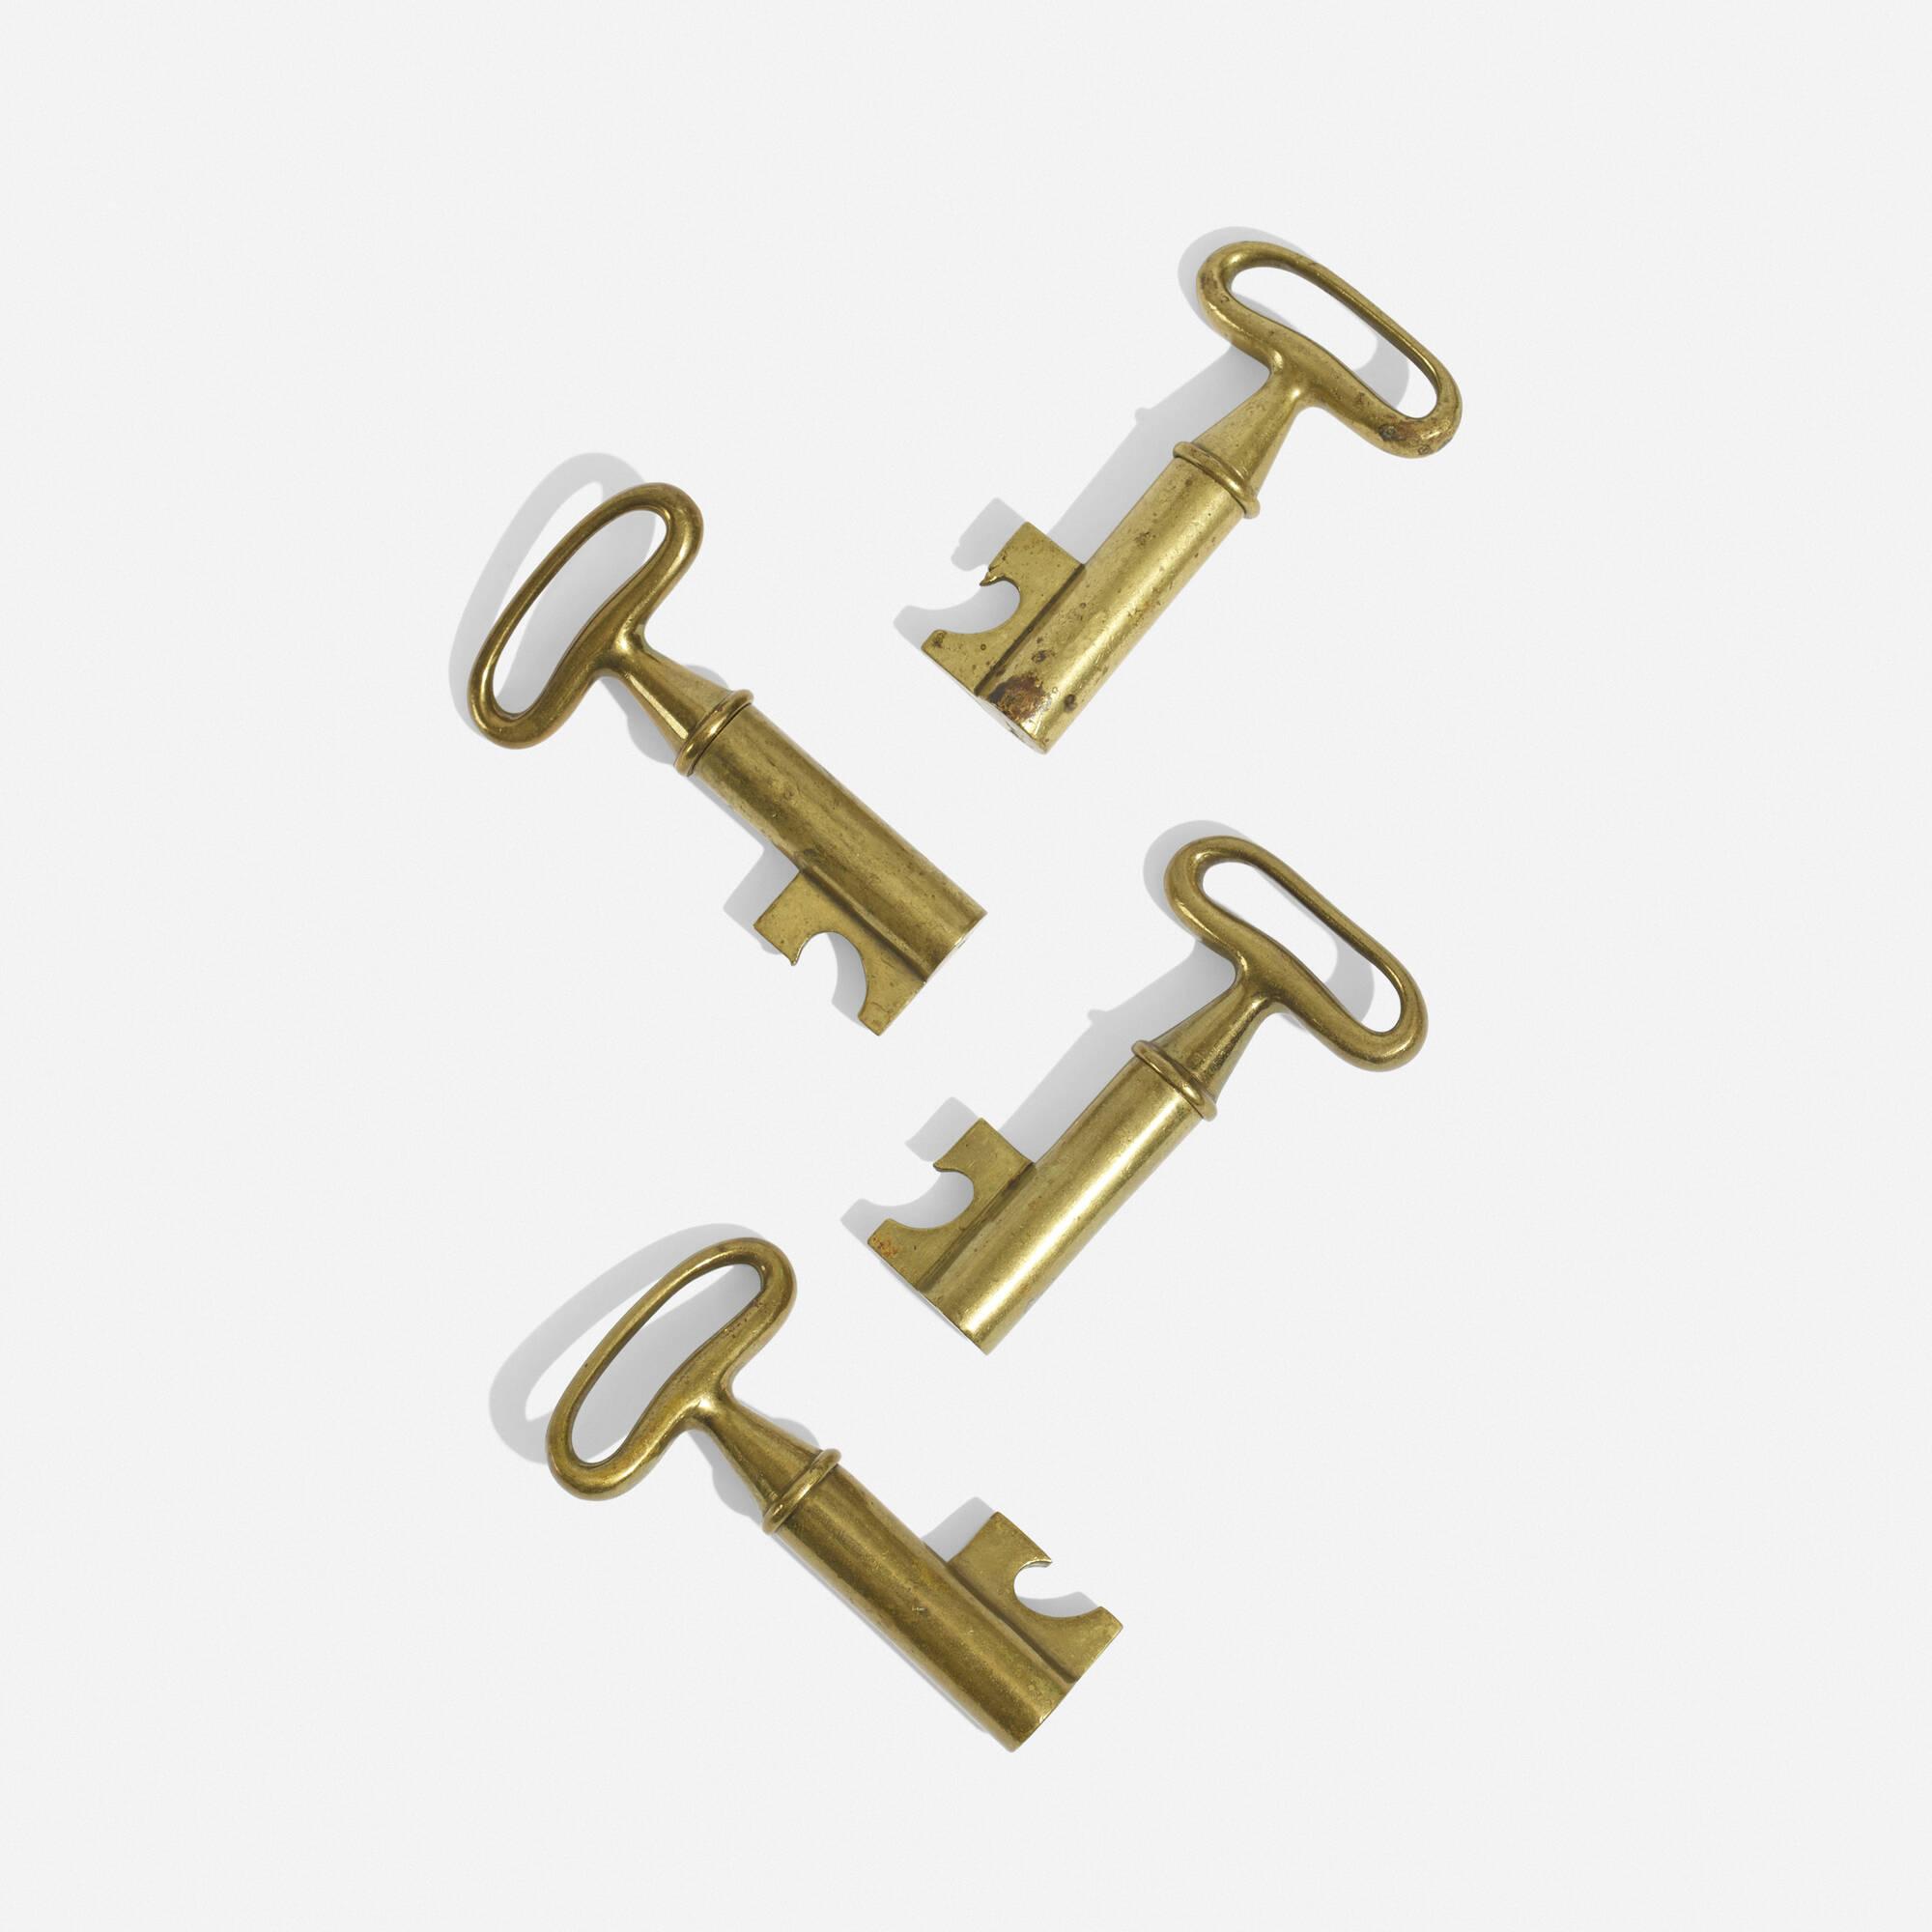 273: Carl Auböck II / corkscrews, set of four (2 of 4)